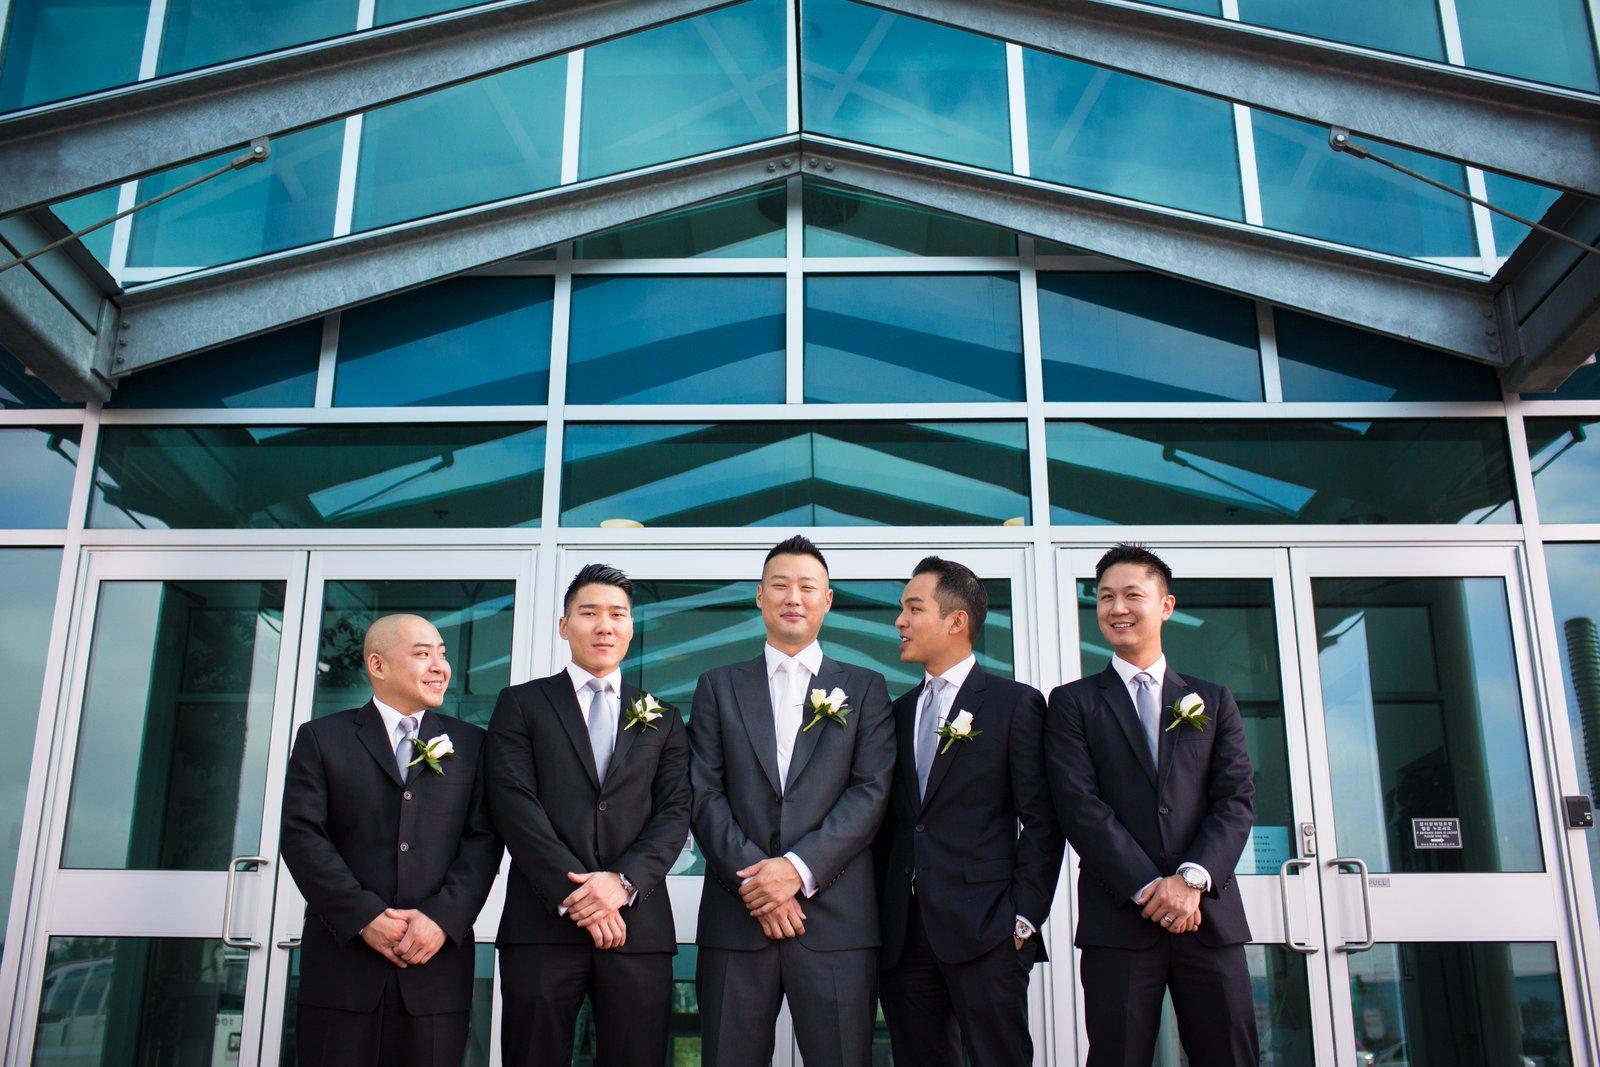 toronto-wedding-photographer-019